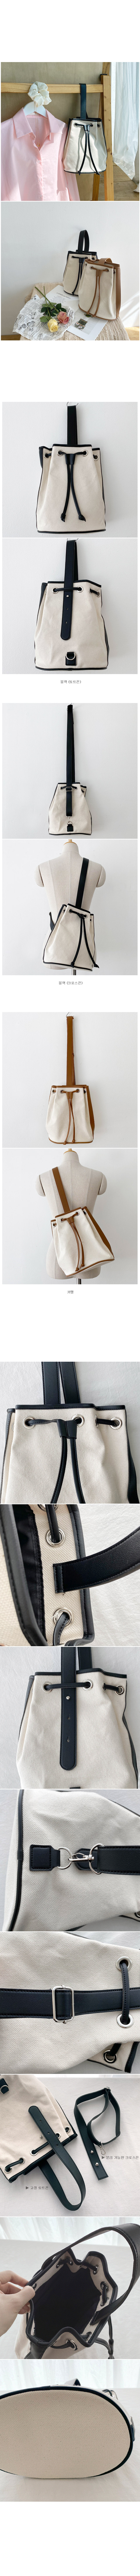 Manny canvas bag